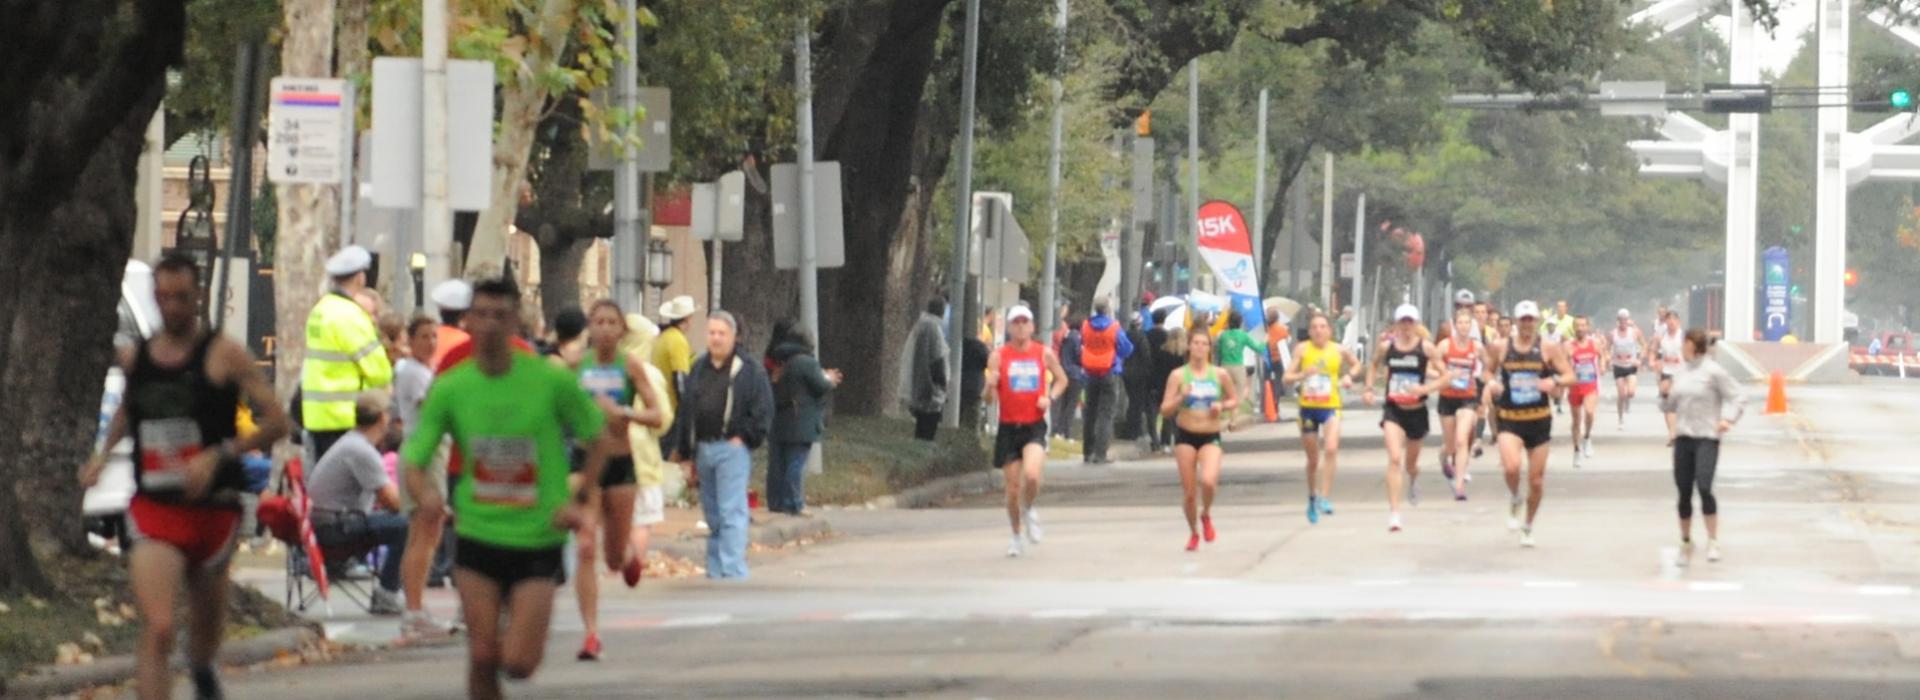 Houston Marathon Adventure Marathon